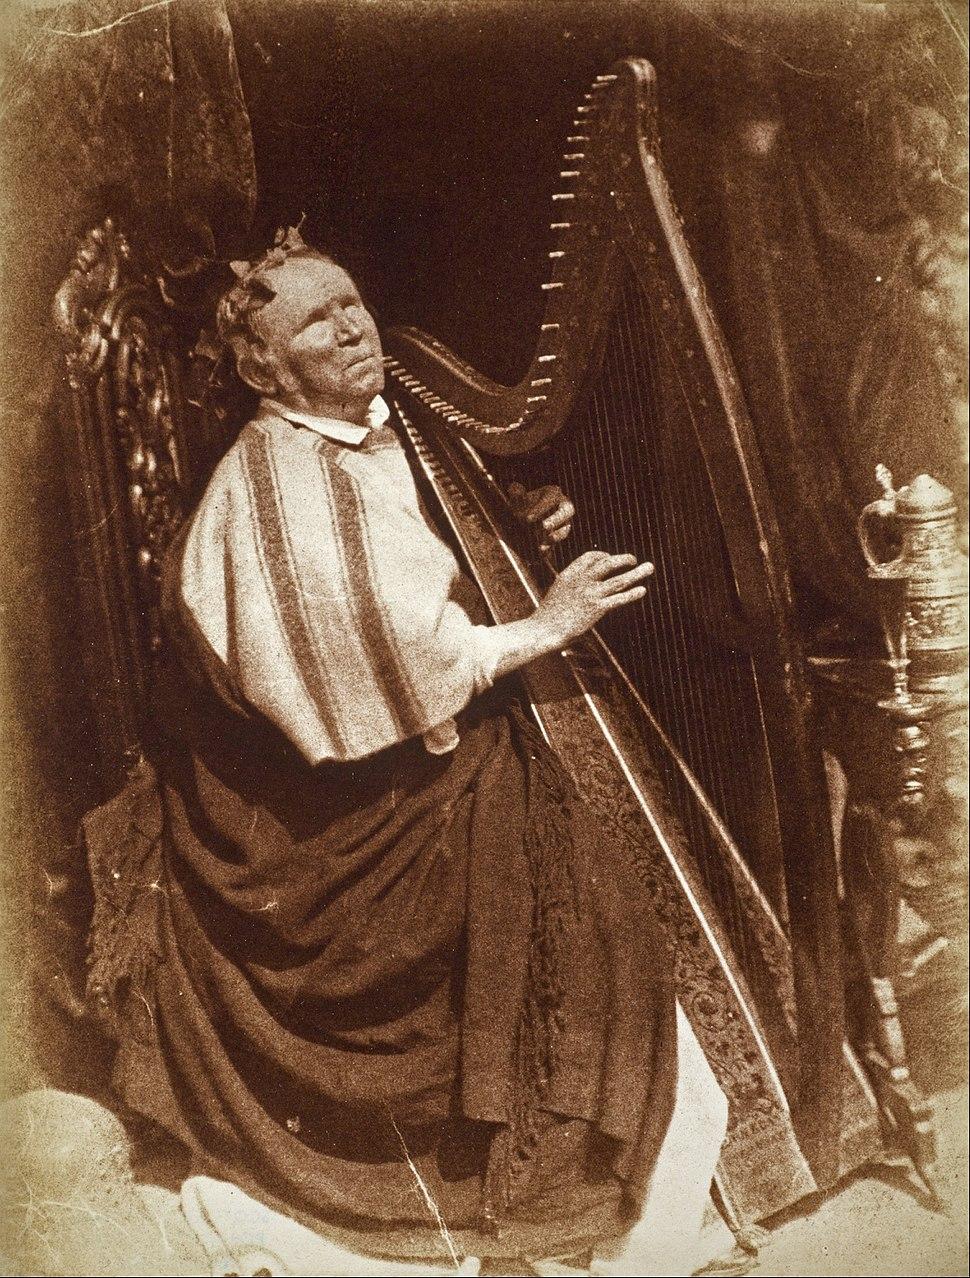 David Octavius Hill and Robert Adamson - Patrick Byrne, about 1794 - 1863. Irish Harpist - Google Art Project